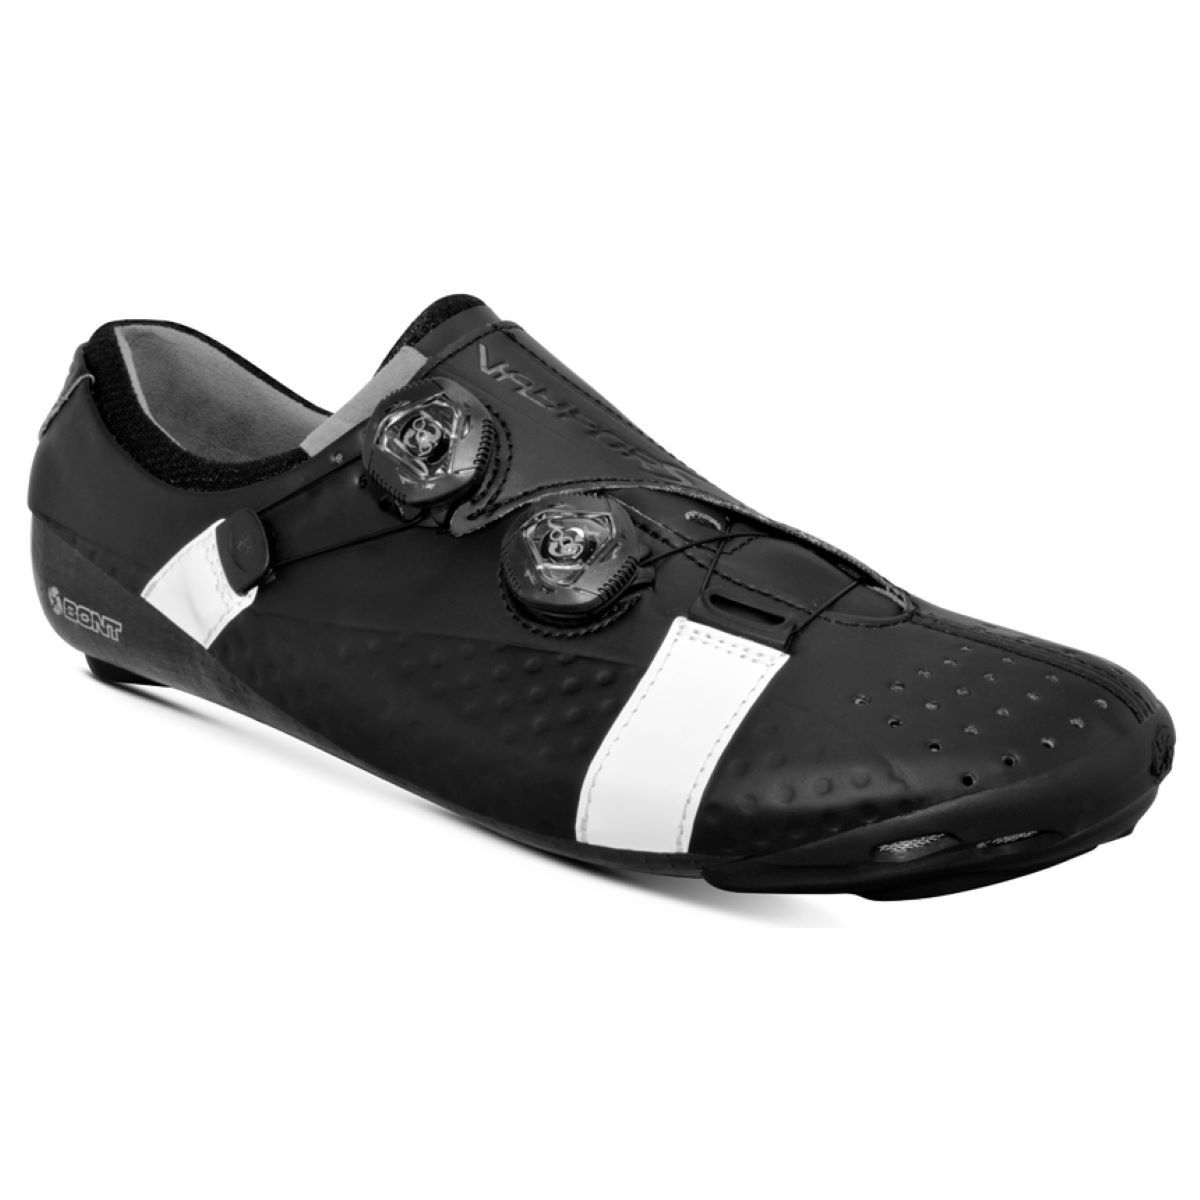 Bont Vaypor S Road Shoe Road Shoes Road Cycling Shoes Shoes Cycling Shoes